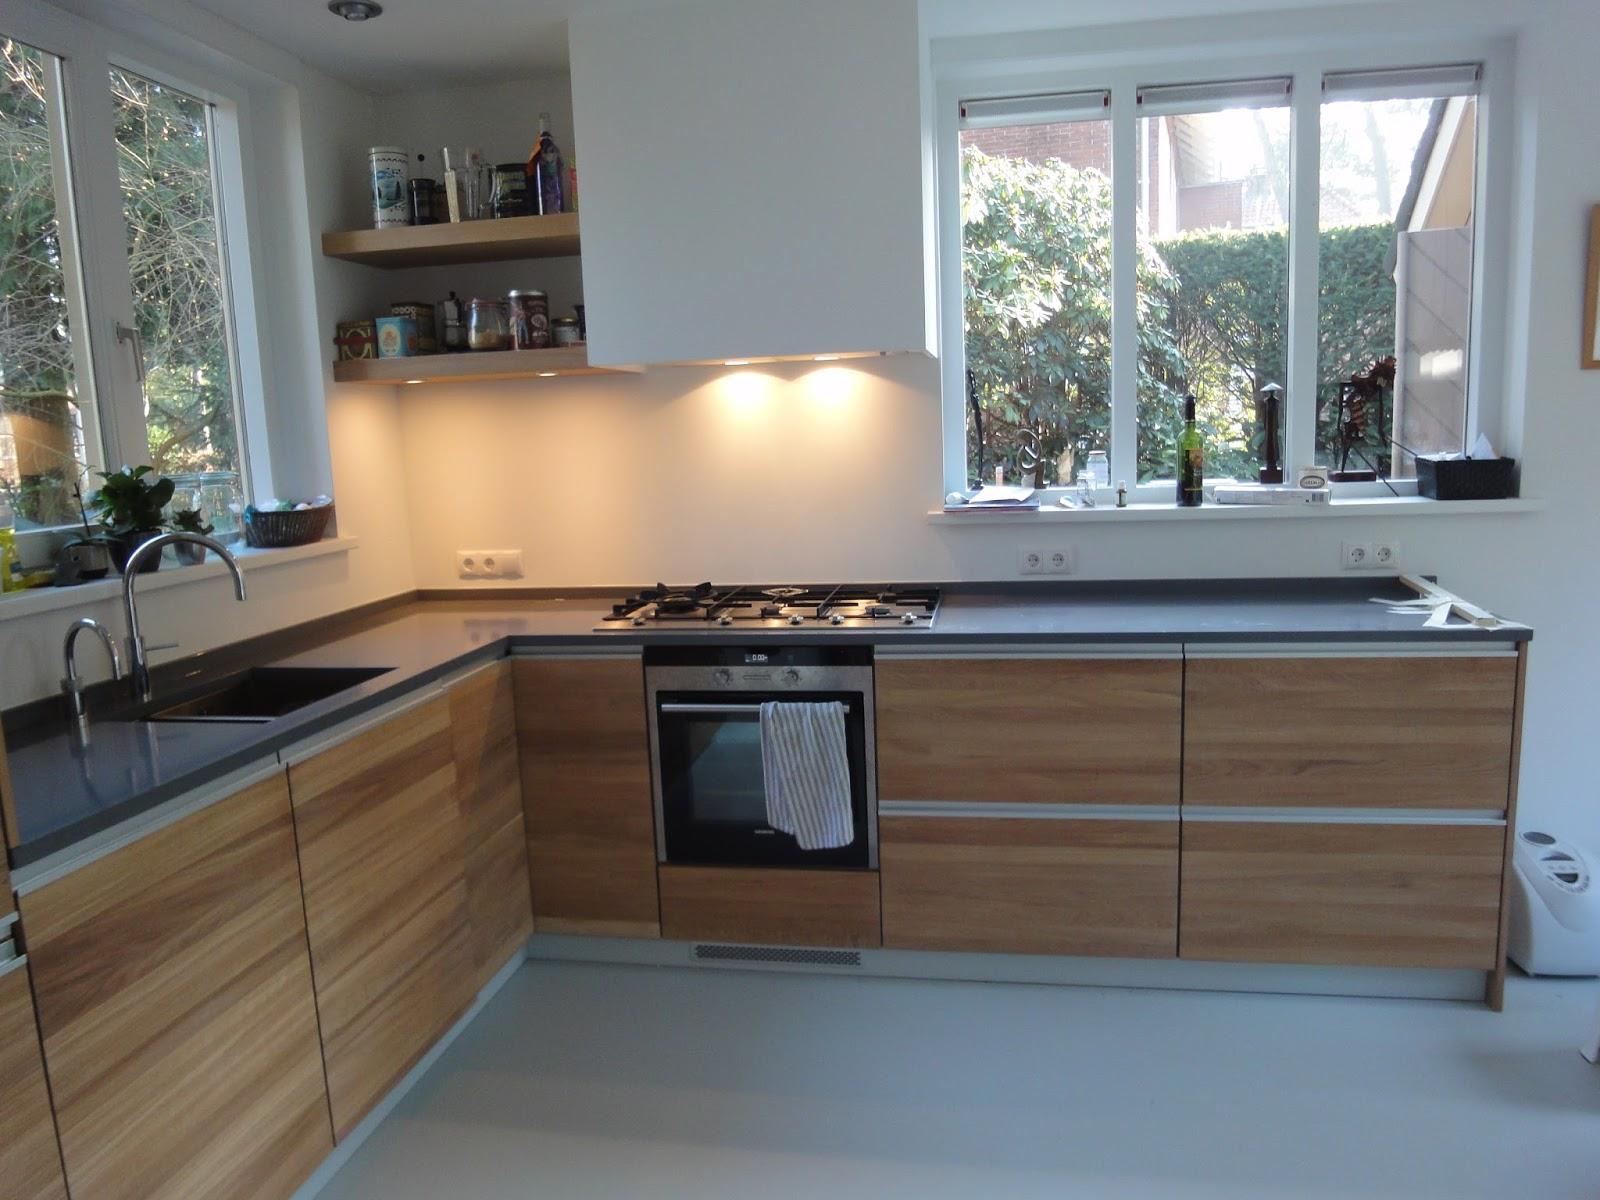 Keuken Greeploos Ikea : maatwerk keuken